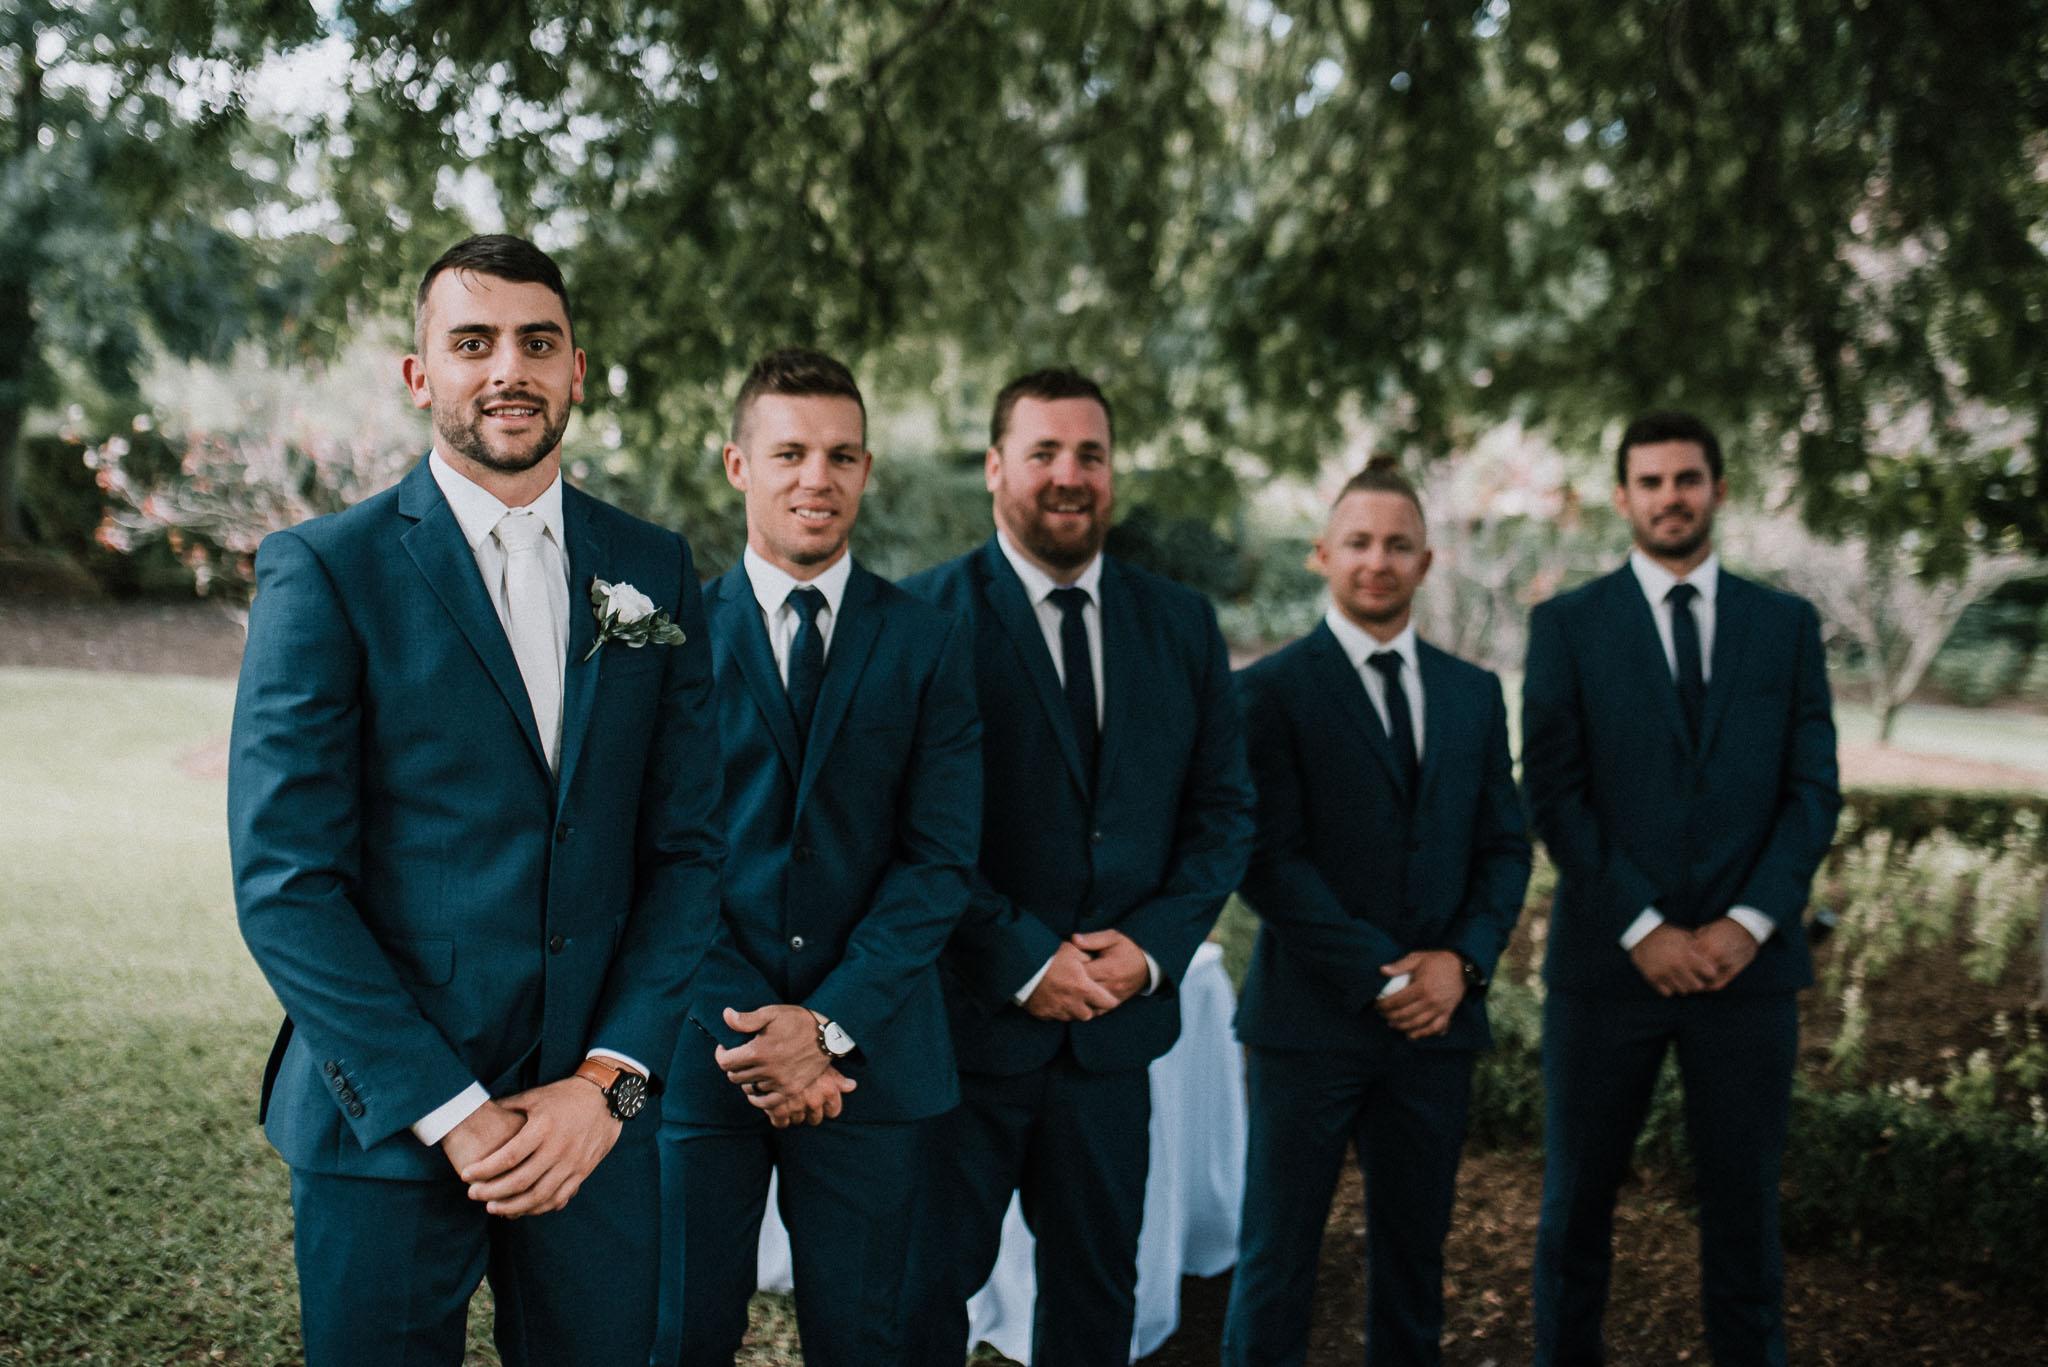 MECURE-RESORT-WEDDING-KING-WEB-16.jpg